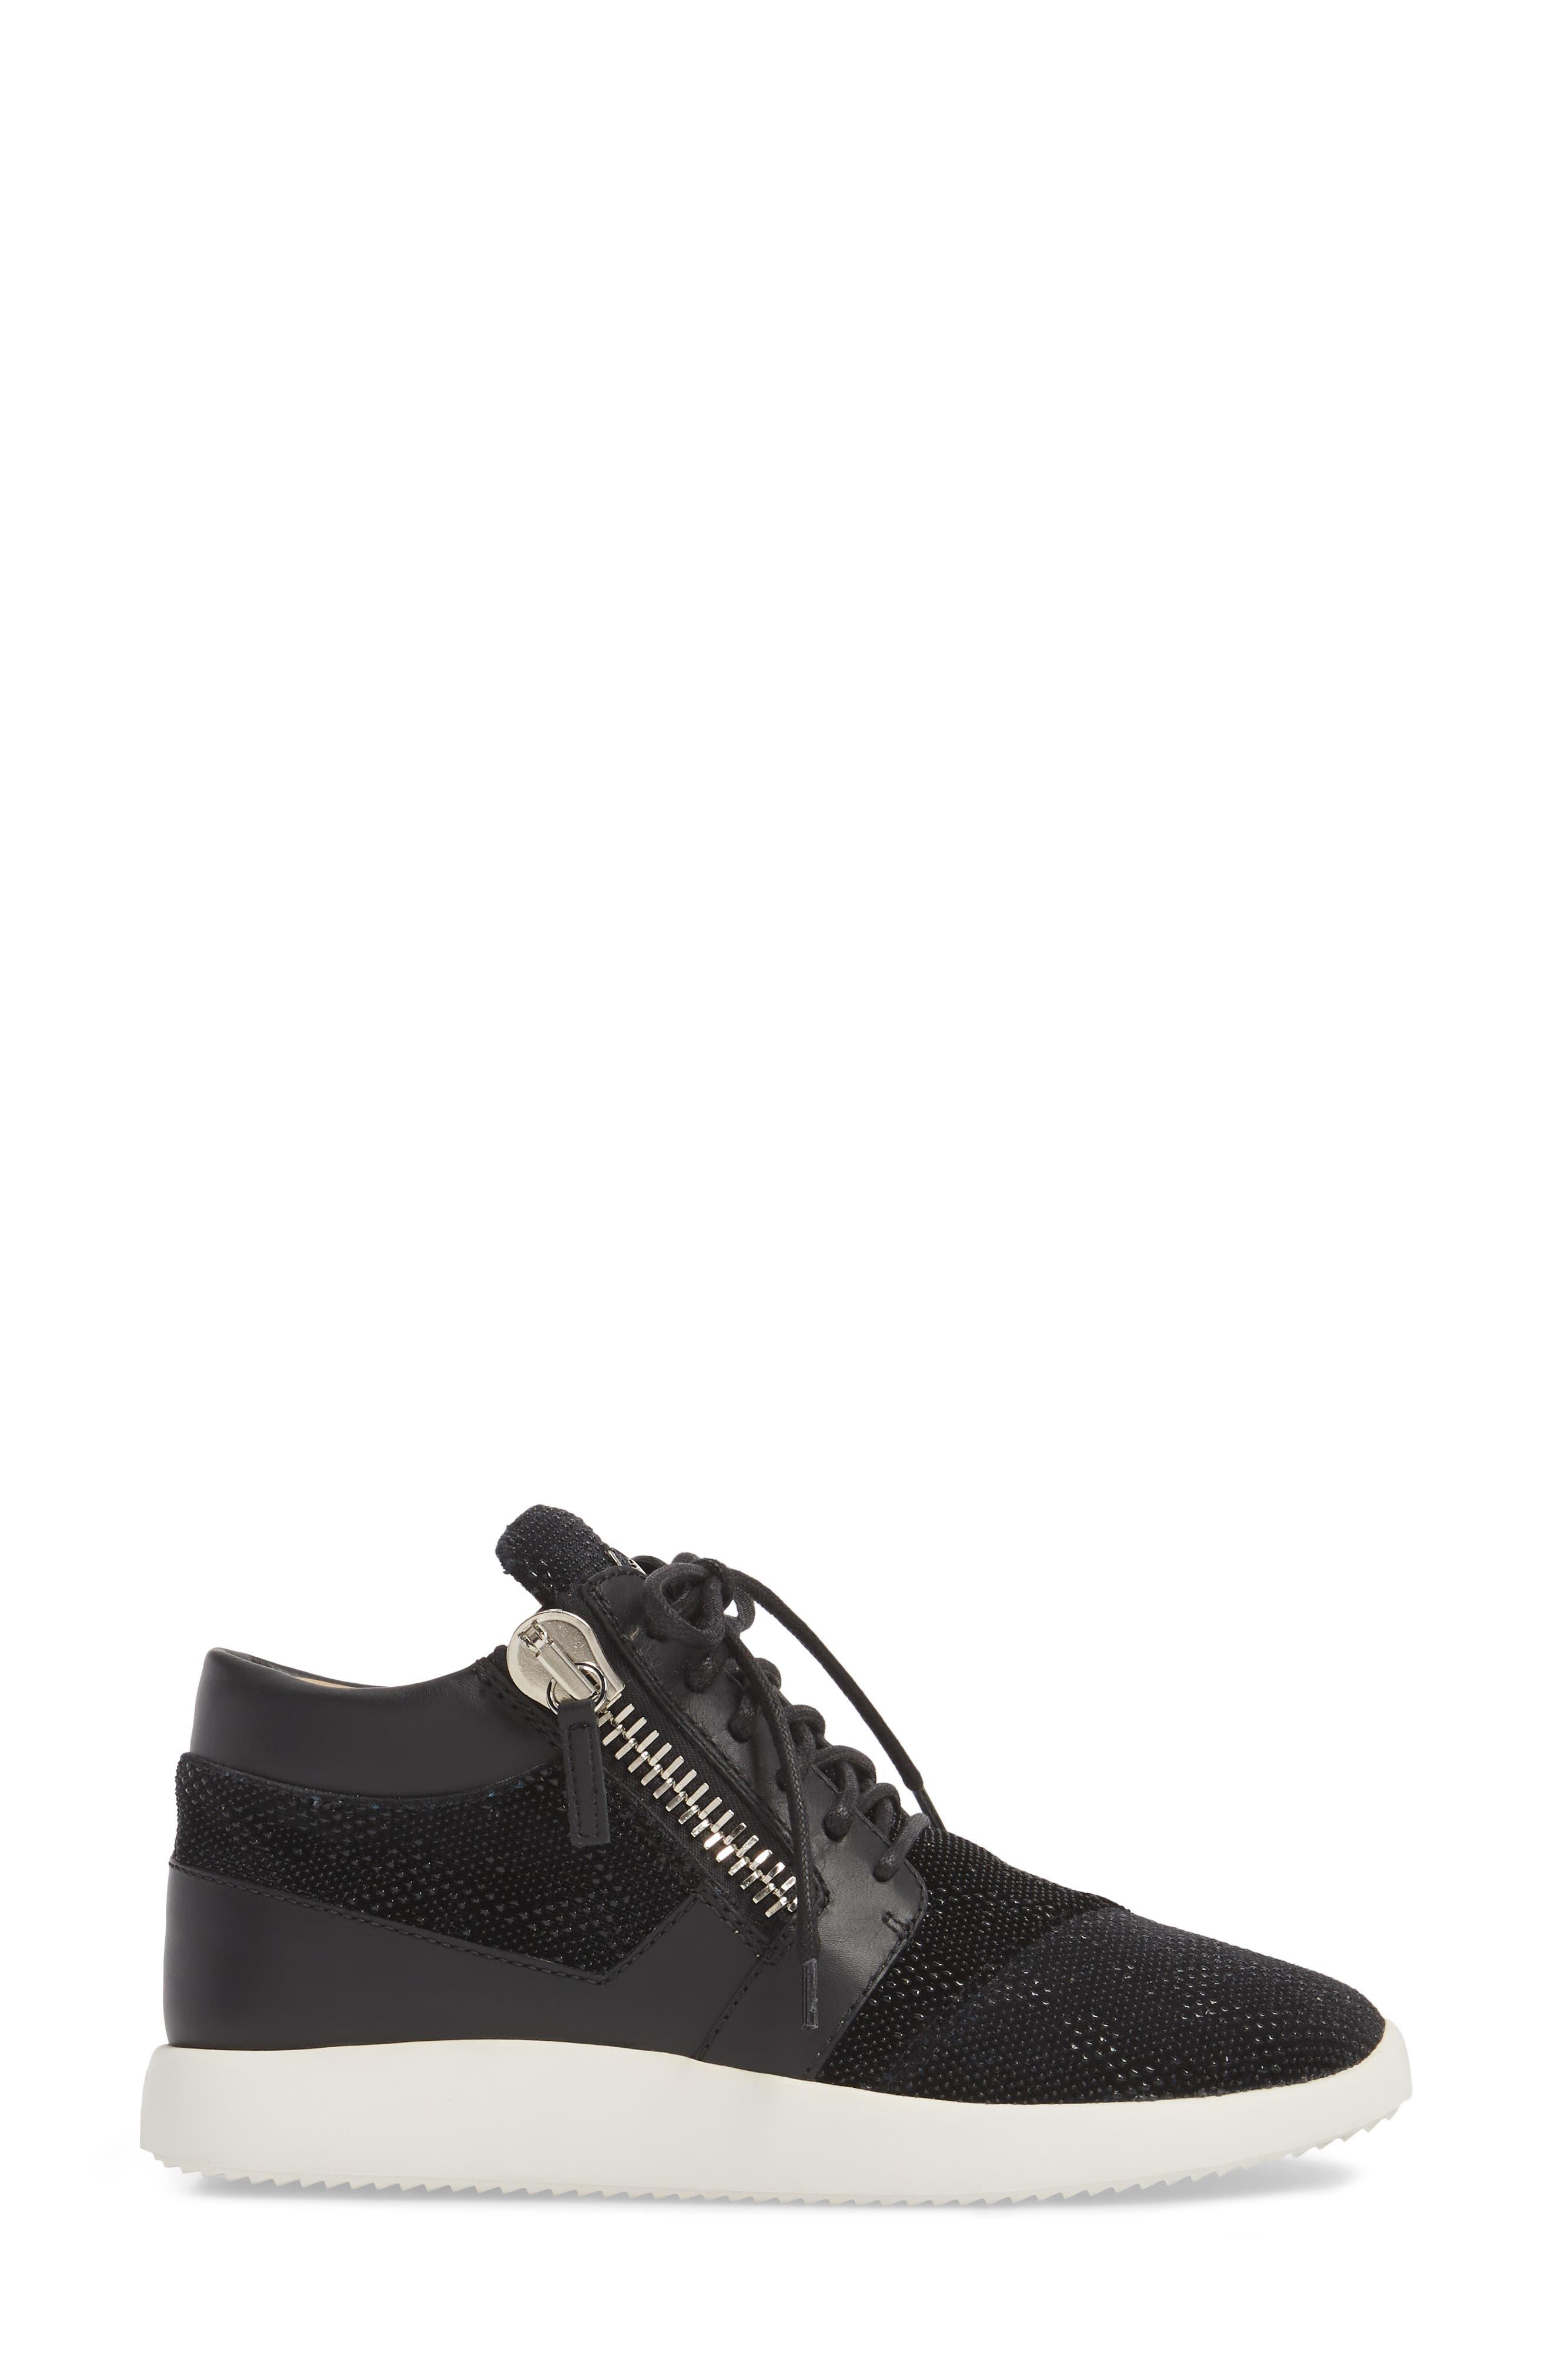 Mid Top Sneaker,                             Alternate thumbnail 3, color,                             Black